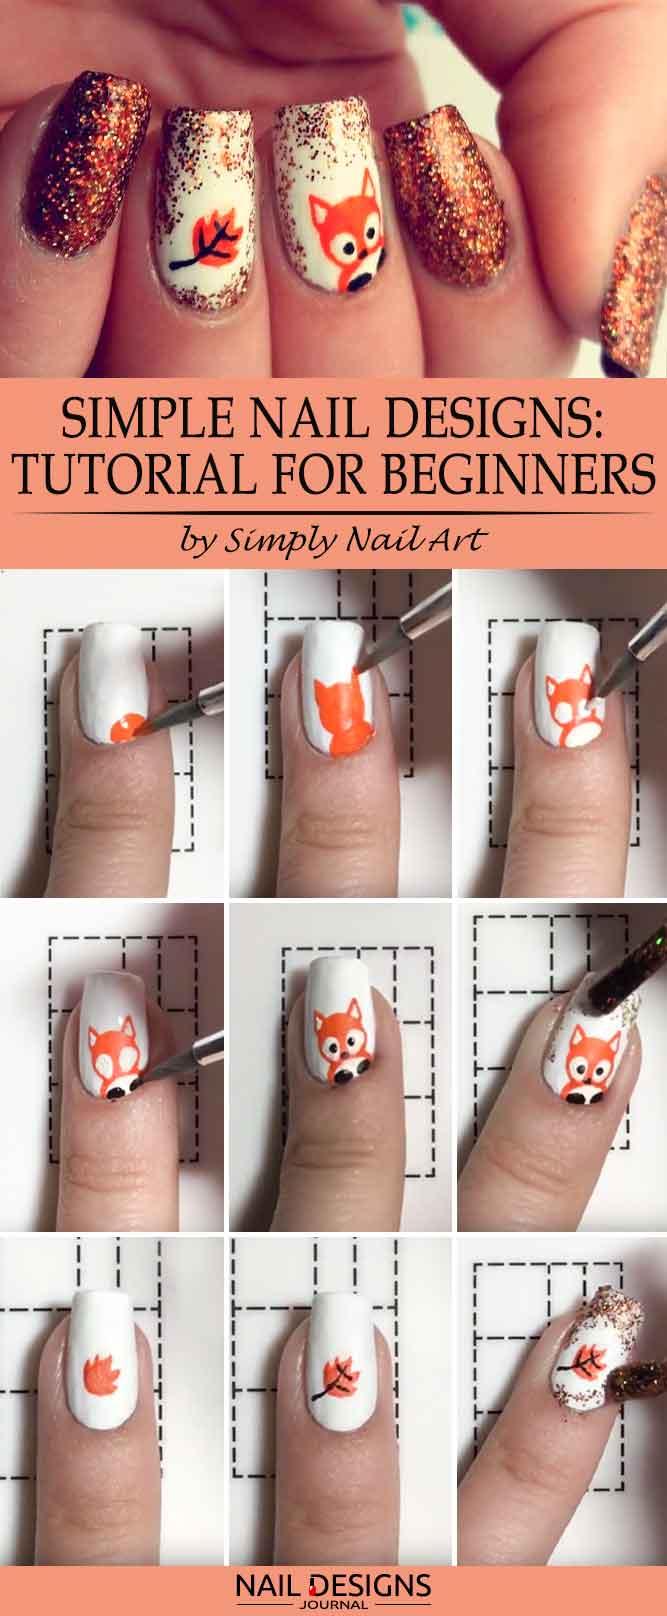 3 Foxy Nails Ideas To Make Everyone Crazy Naildesignsjournal